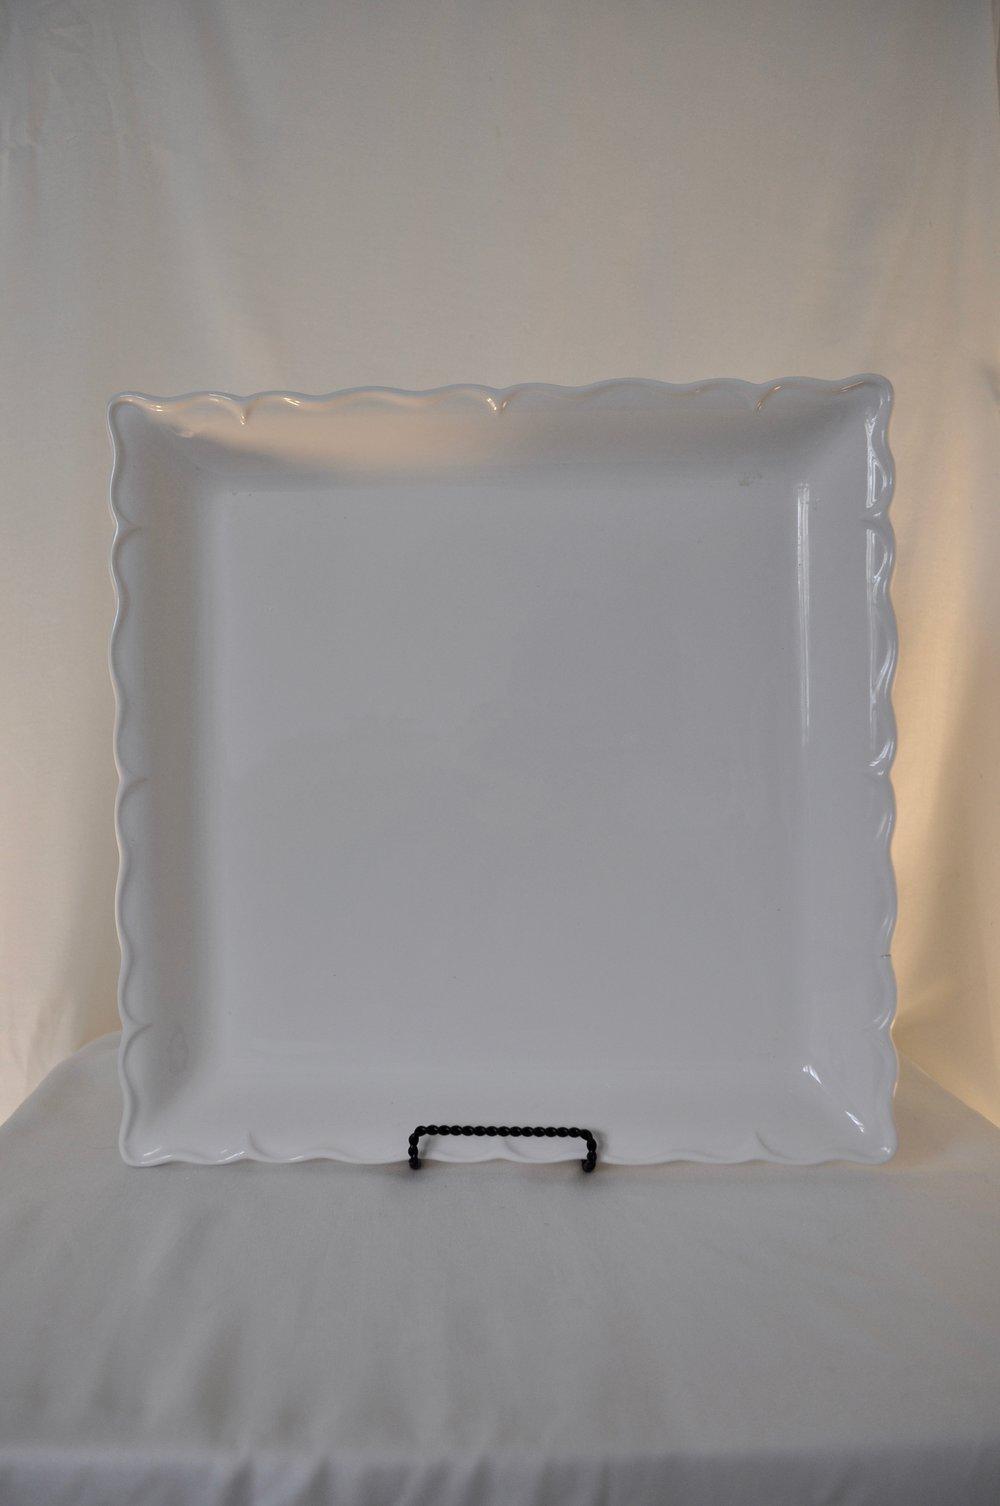 "White Square Cake Plates 12.5x12.5"" - Qty: 2"